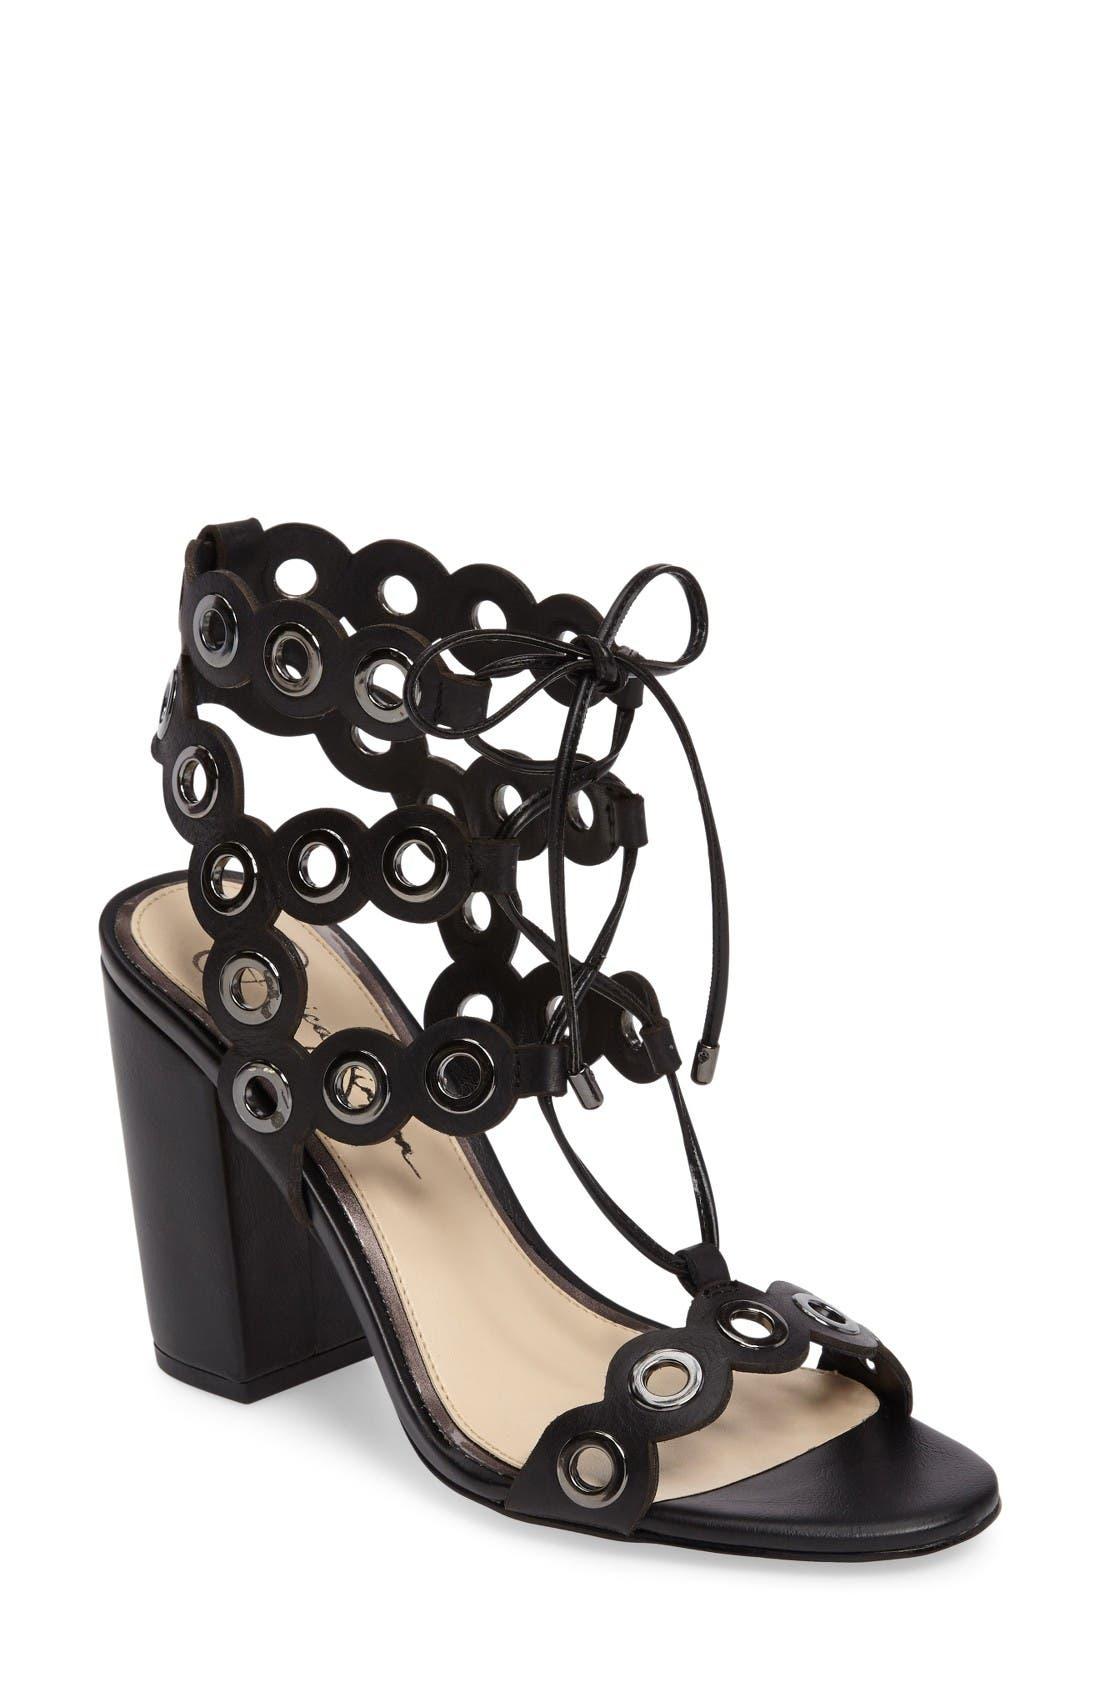 Alternate Image 1 Selected - Jessica Simpson Kariss Lace-Up Sandal (Women)